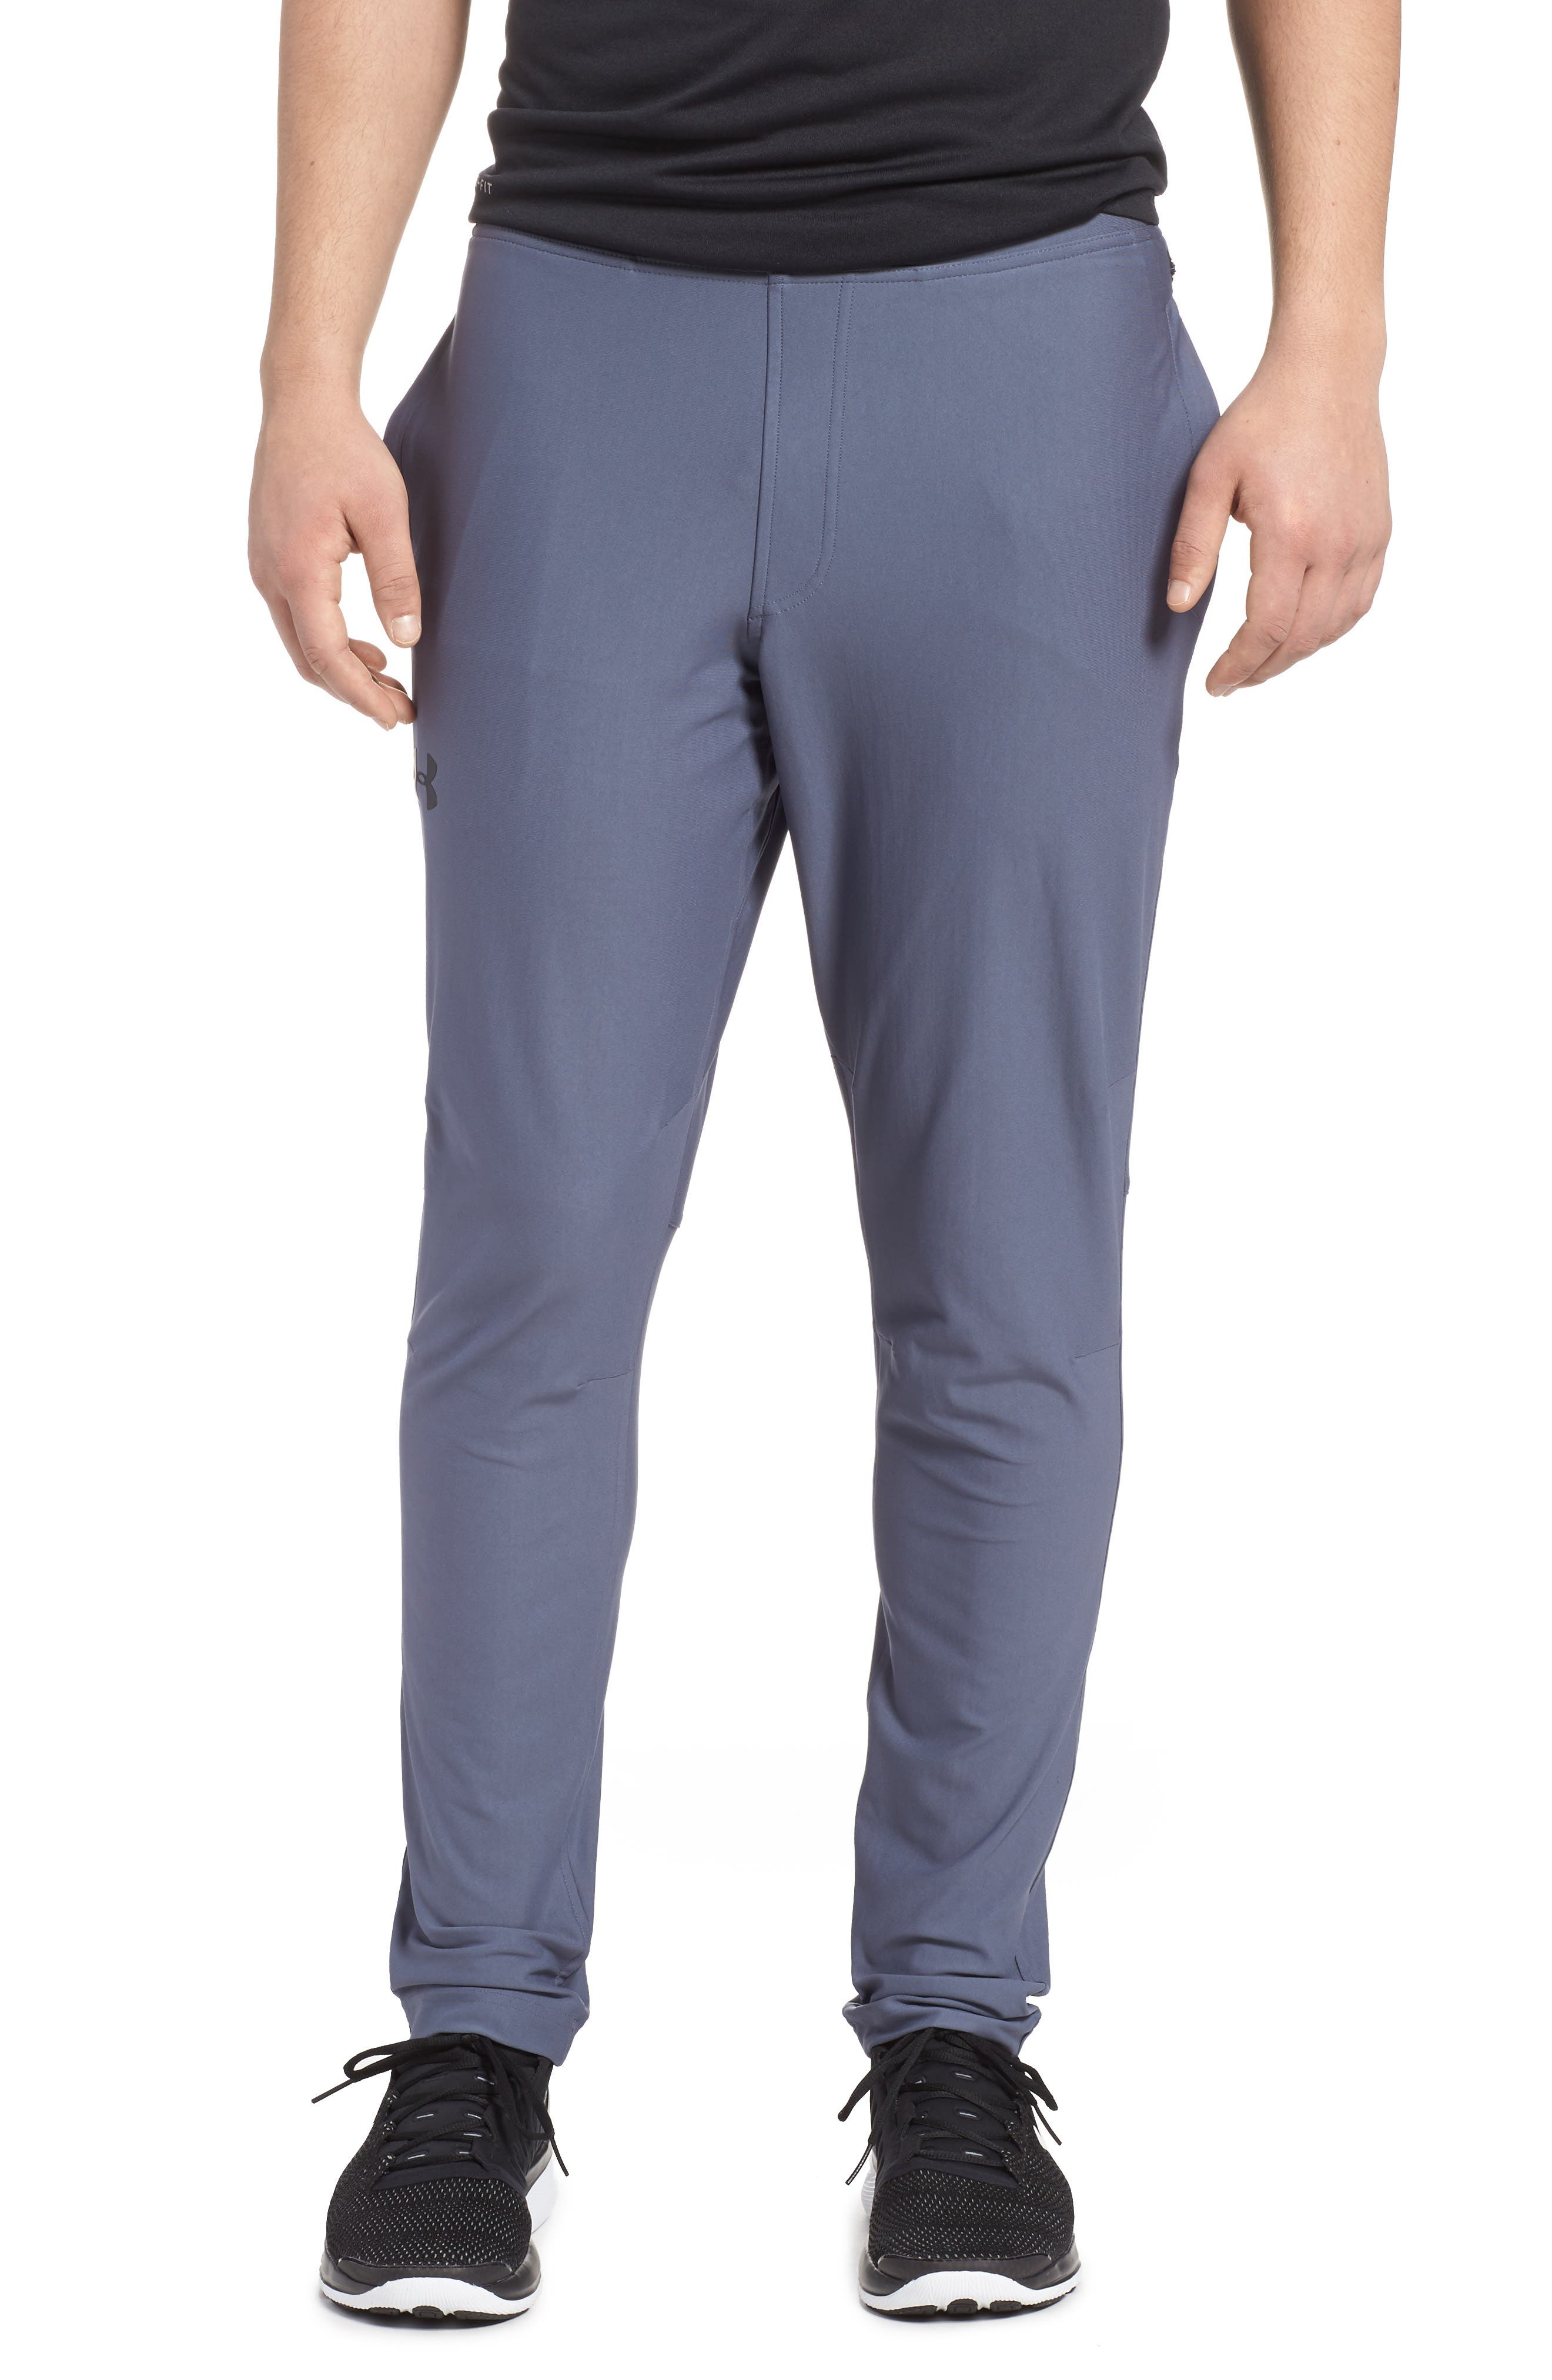 Elevated Pants,                         Main,                         color, Apollo Green/ Black